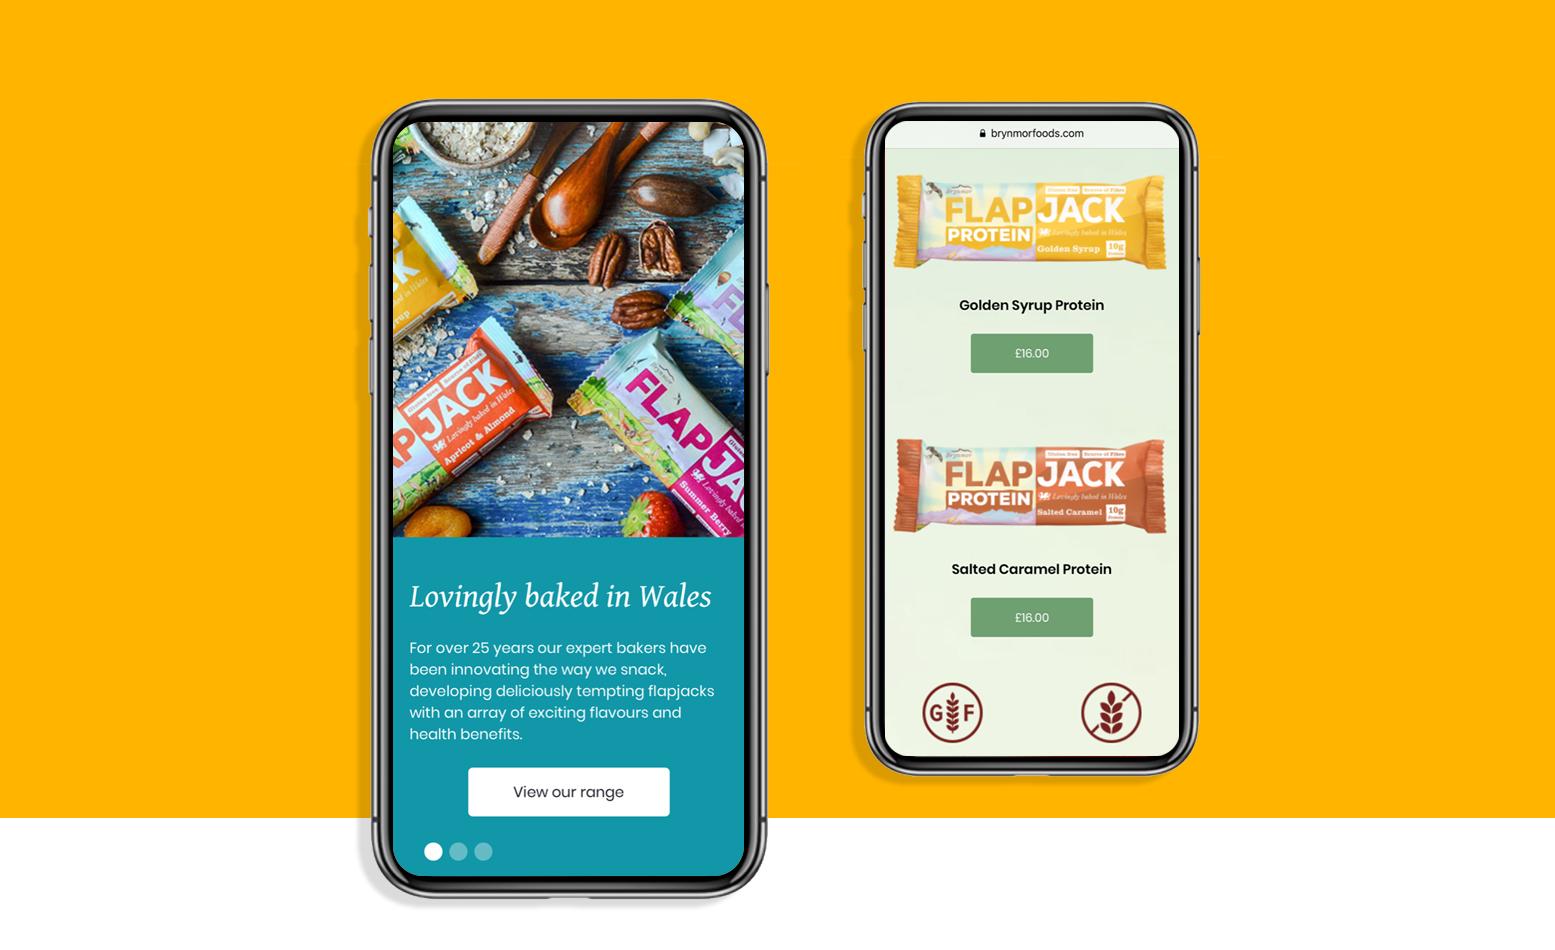 Brynmor mobile website